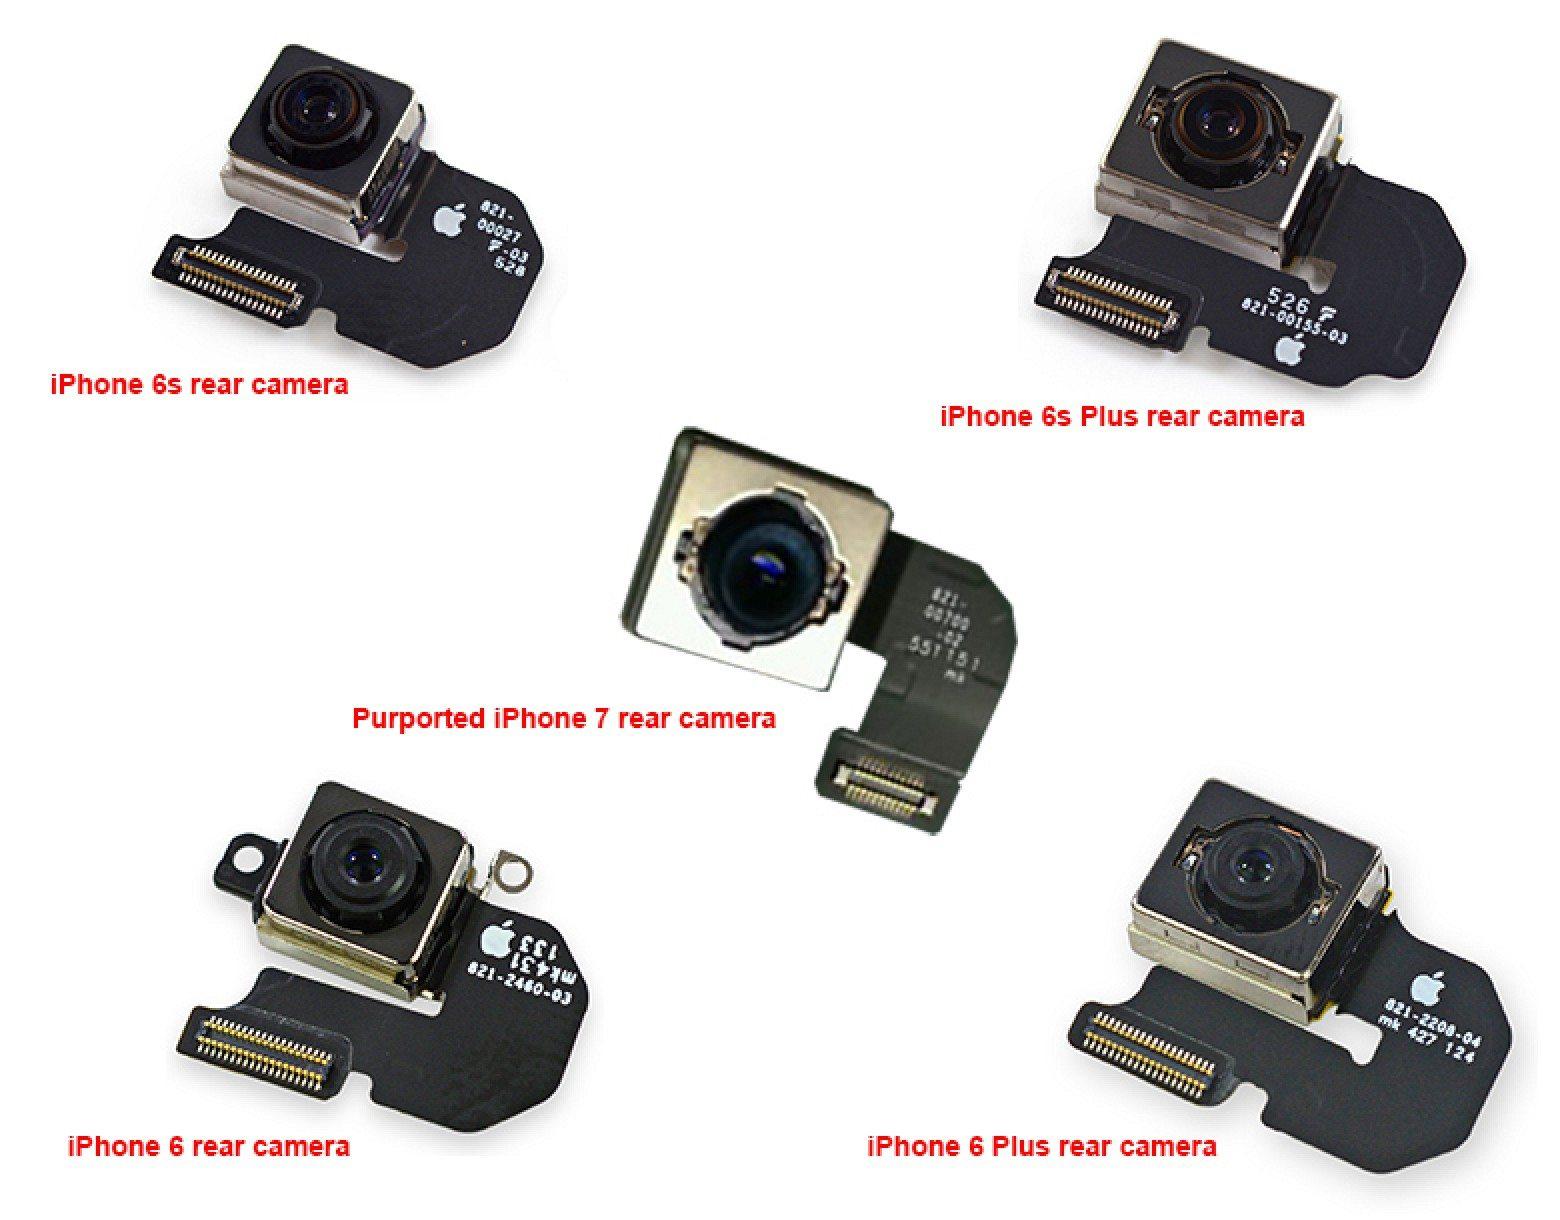 iPhone 7 camera OIS present